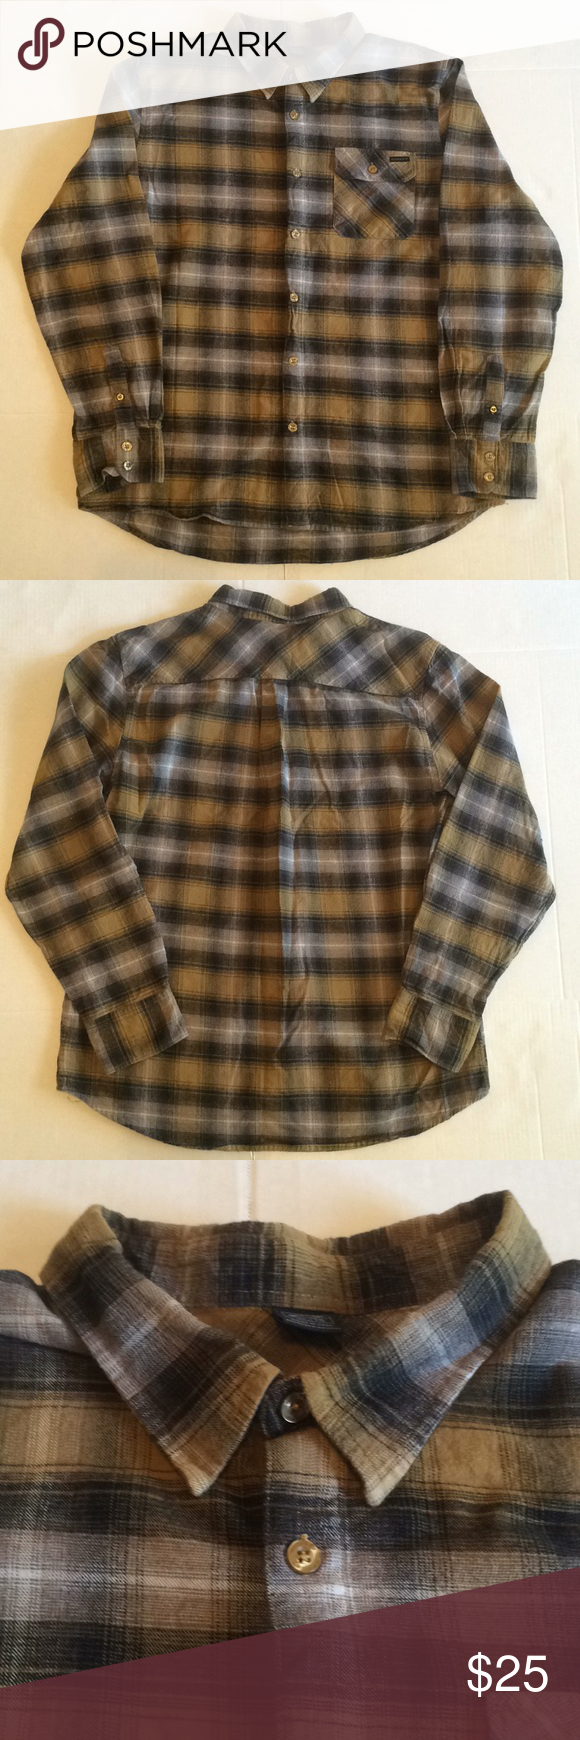 Flannel shirt black and grey  Menus Oakley Plaids u Checks Flannel shirt XL PreOwned Menus Oakley